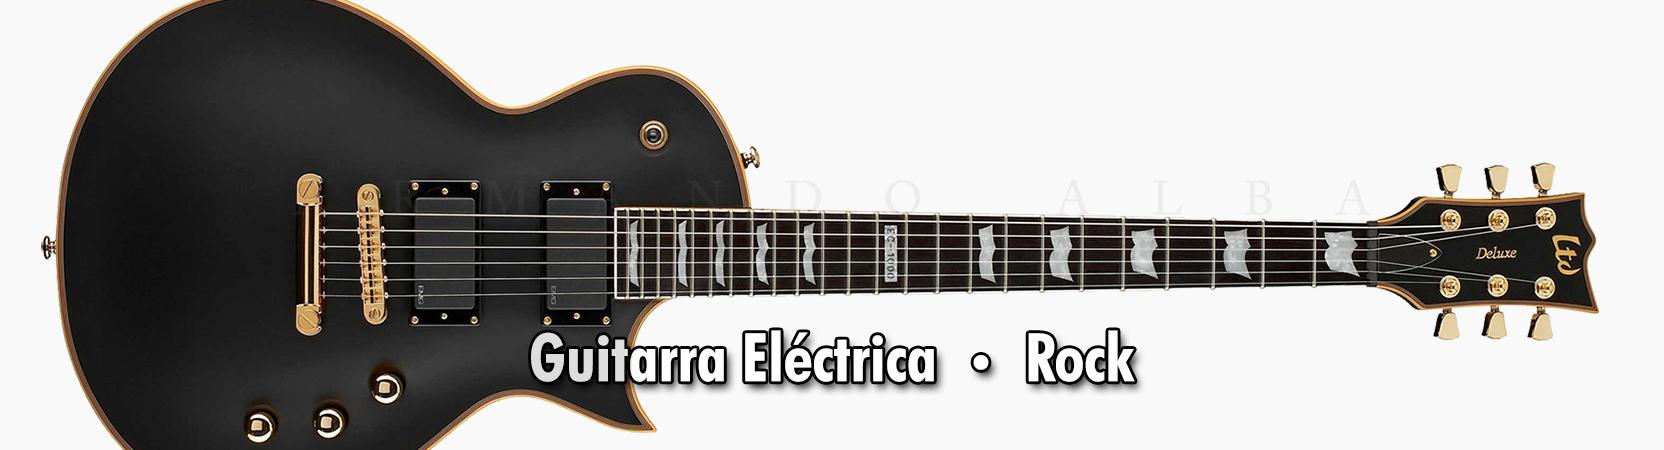 Imagen_para_página_Wix_-_guitarra_electrica_rock_02-1_(1664x450px)